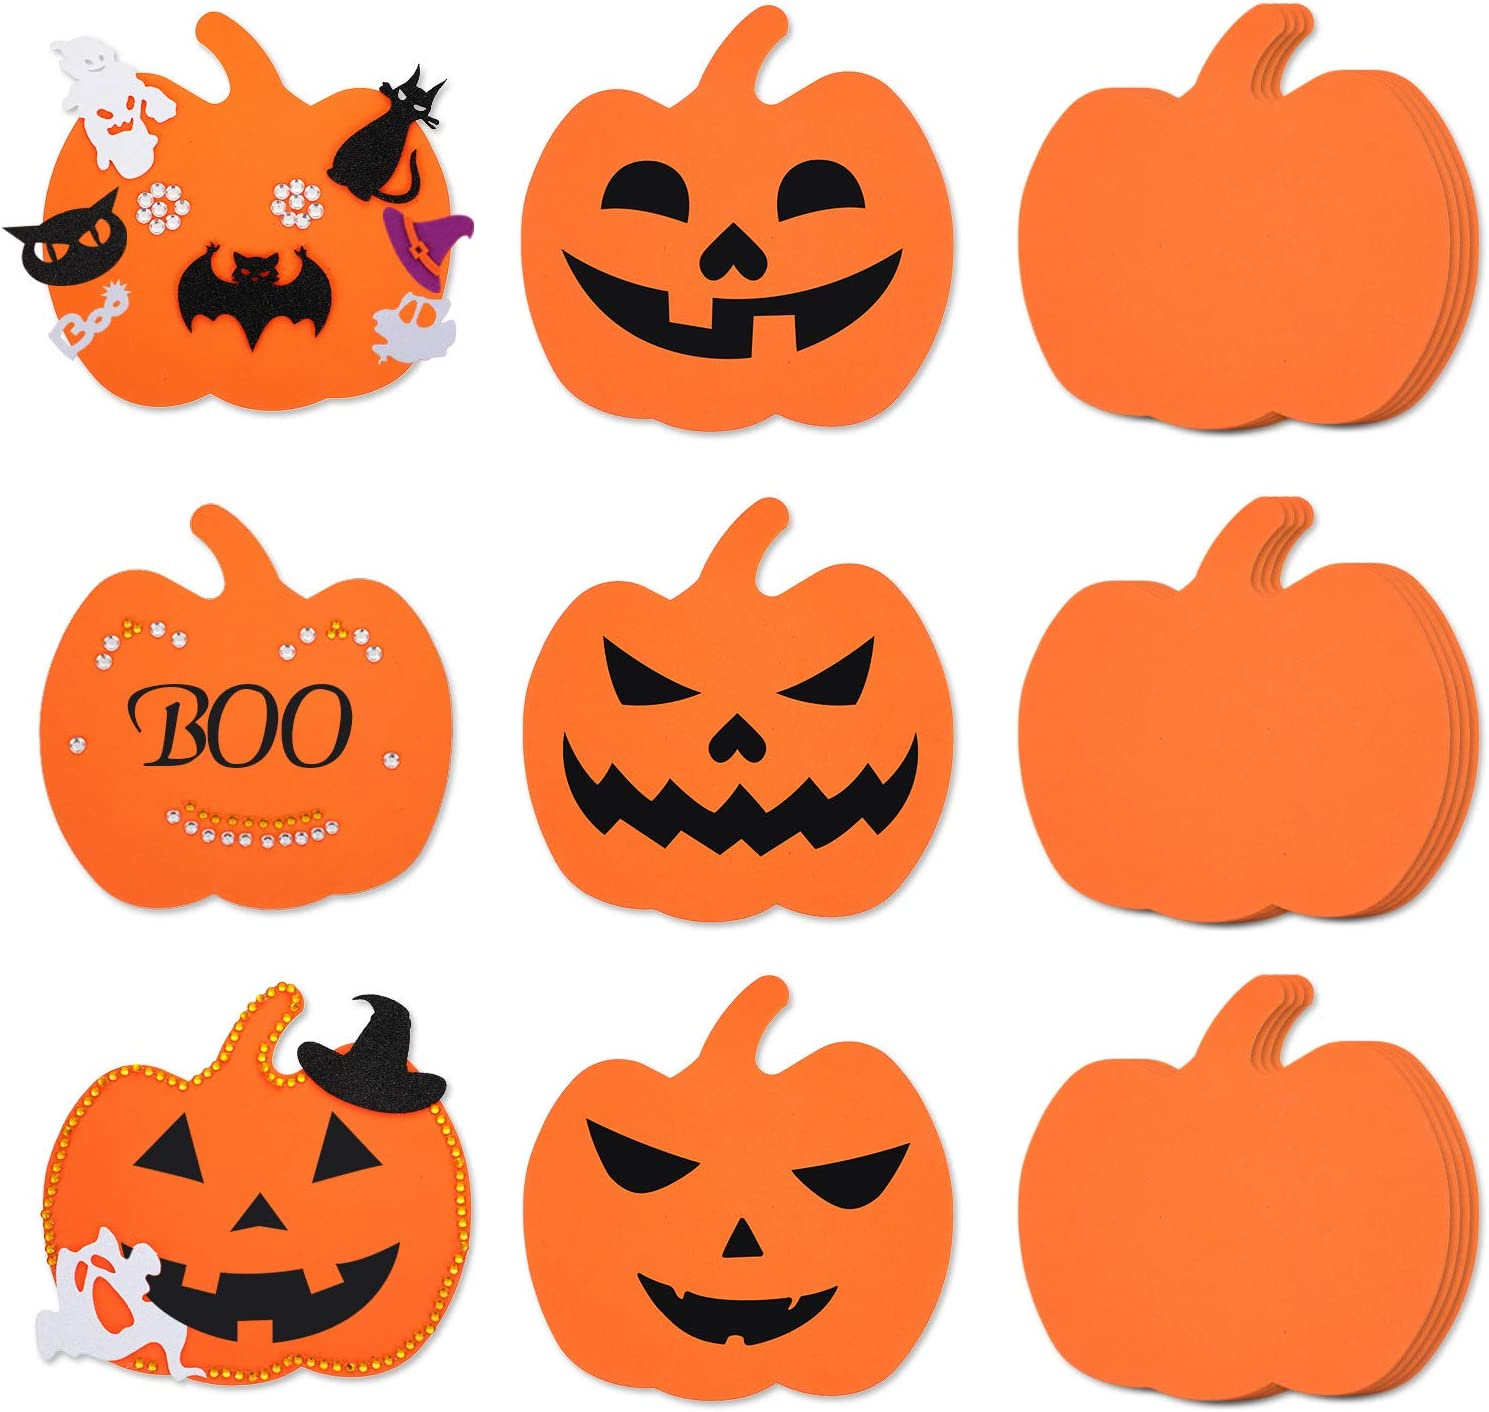 Not Self-Adhesive 36 Pieces Large Halloween Foam Pumpkins Foam Crafts Supplies Decorative Pumpkin Shaped Stickers for Halloween DIY Art Craft 5.9 Inches